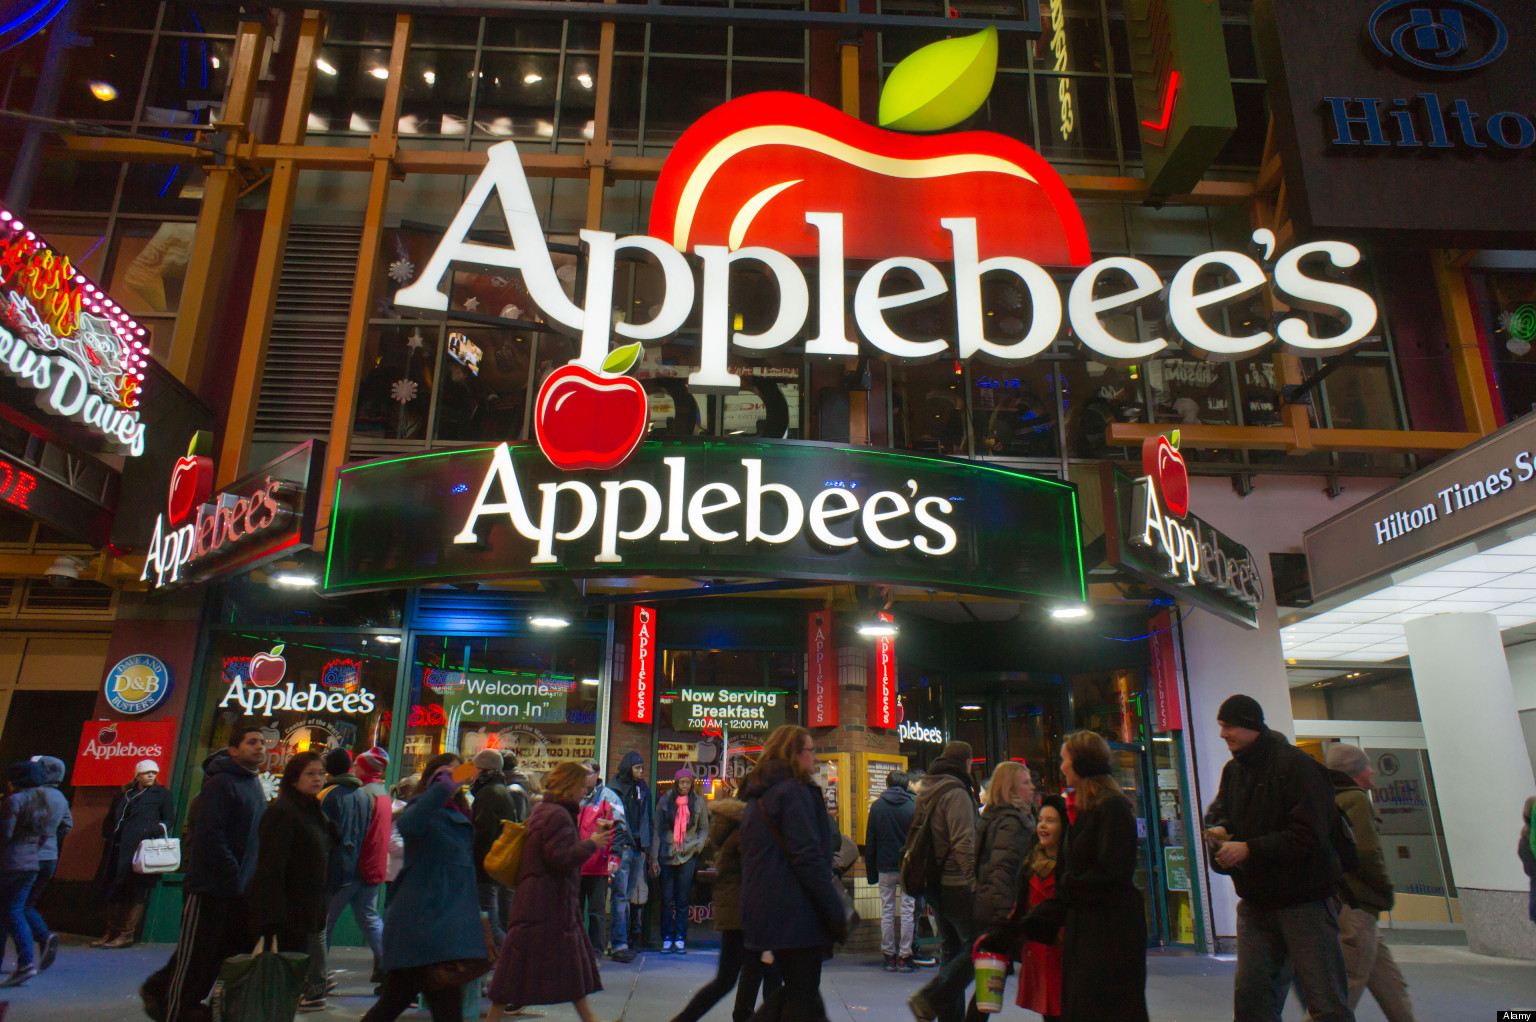 NYC Applebee's